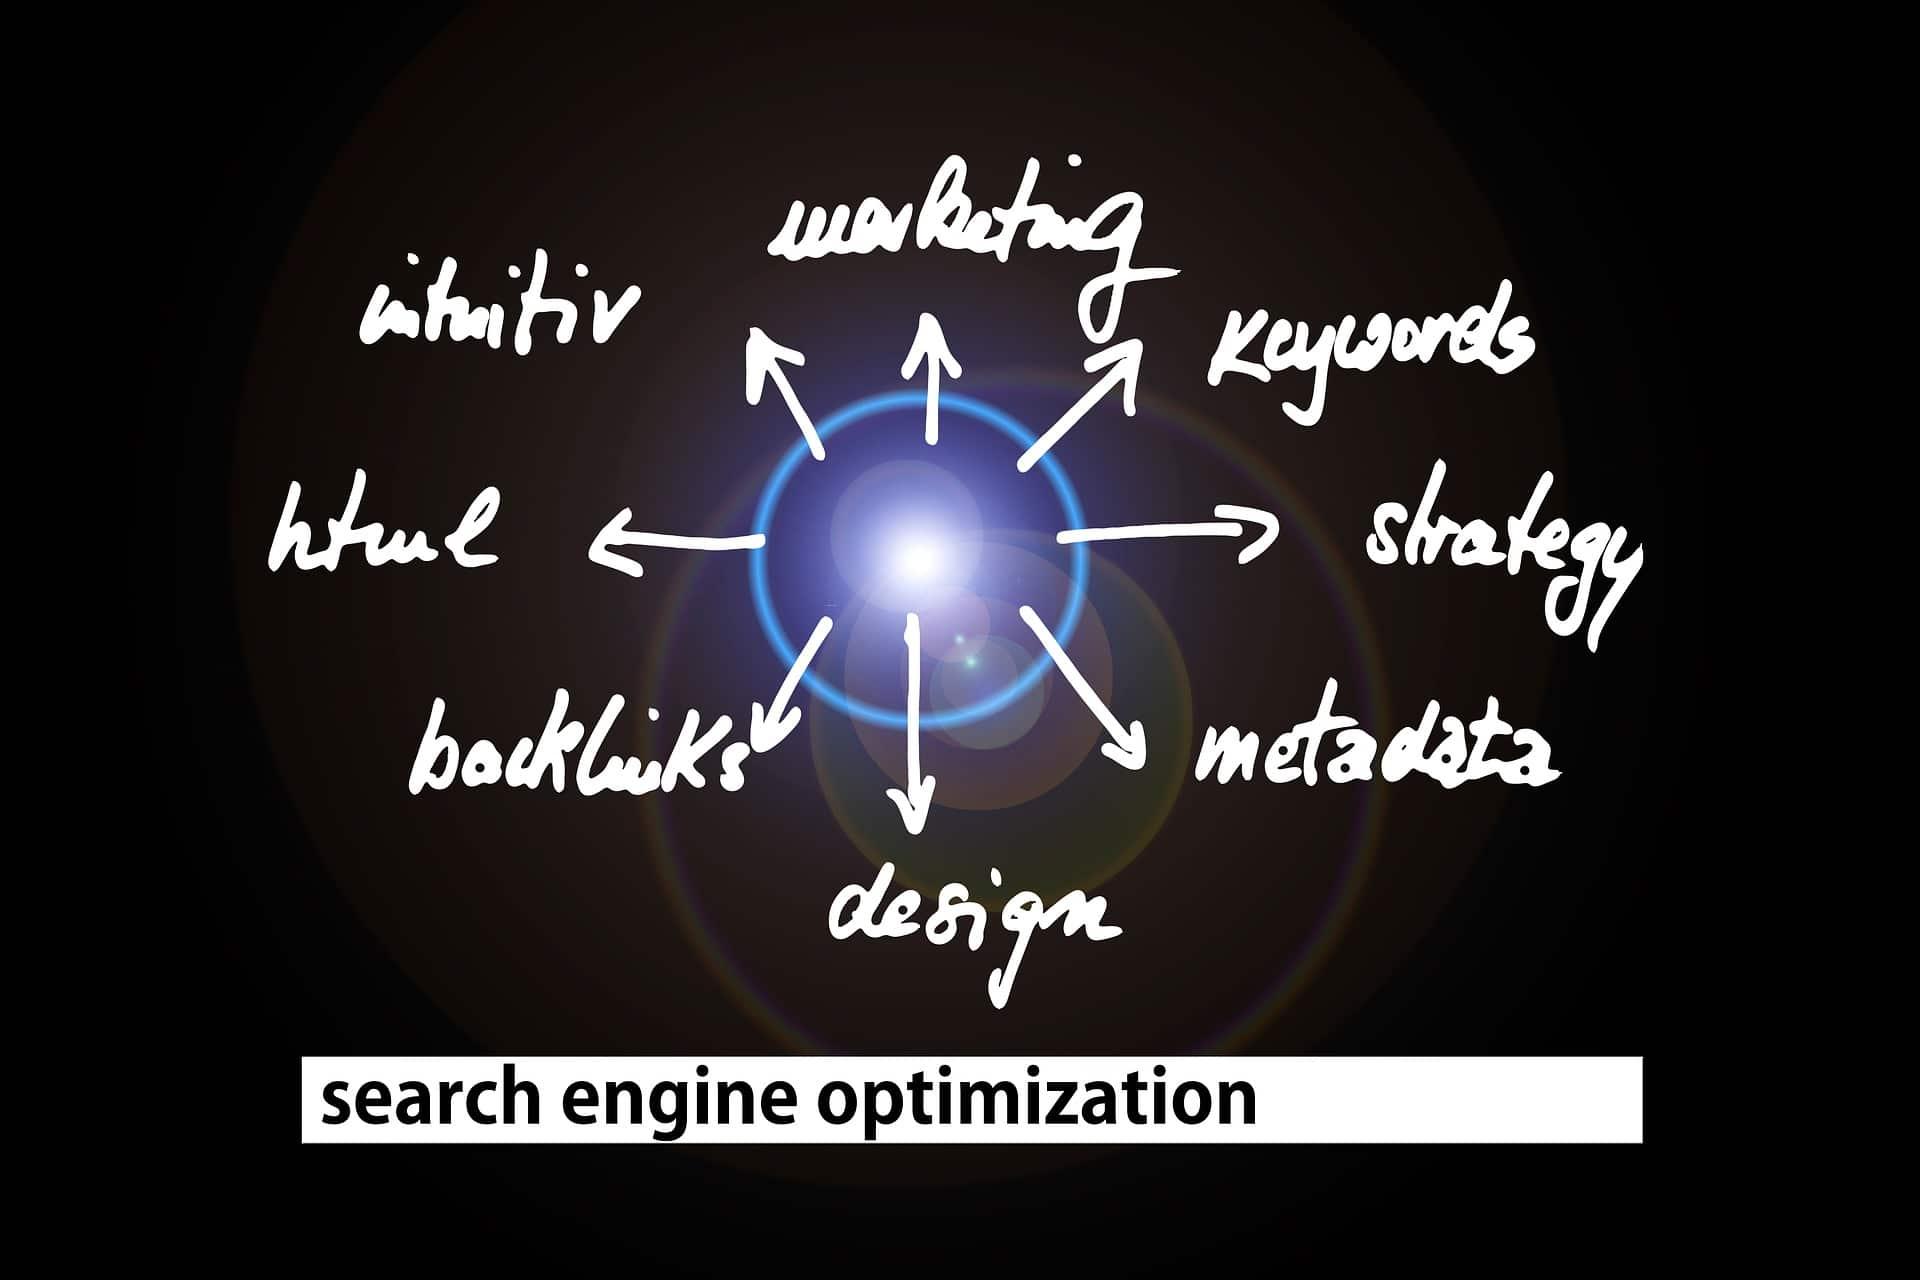 search-engine-optimization-2613846_1920-eps